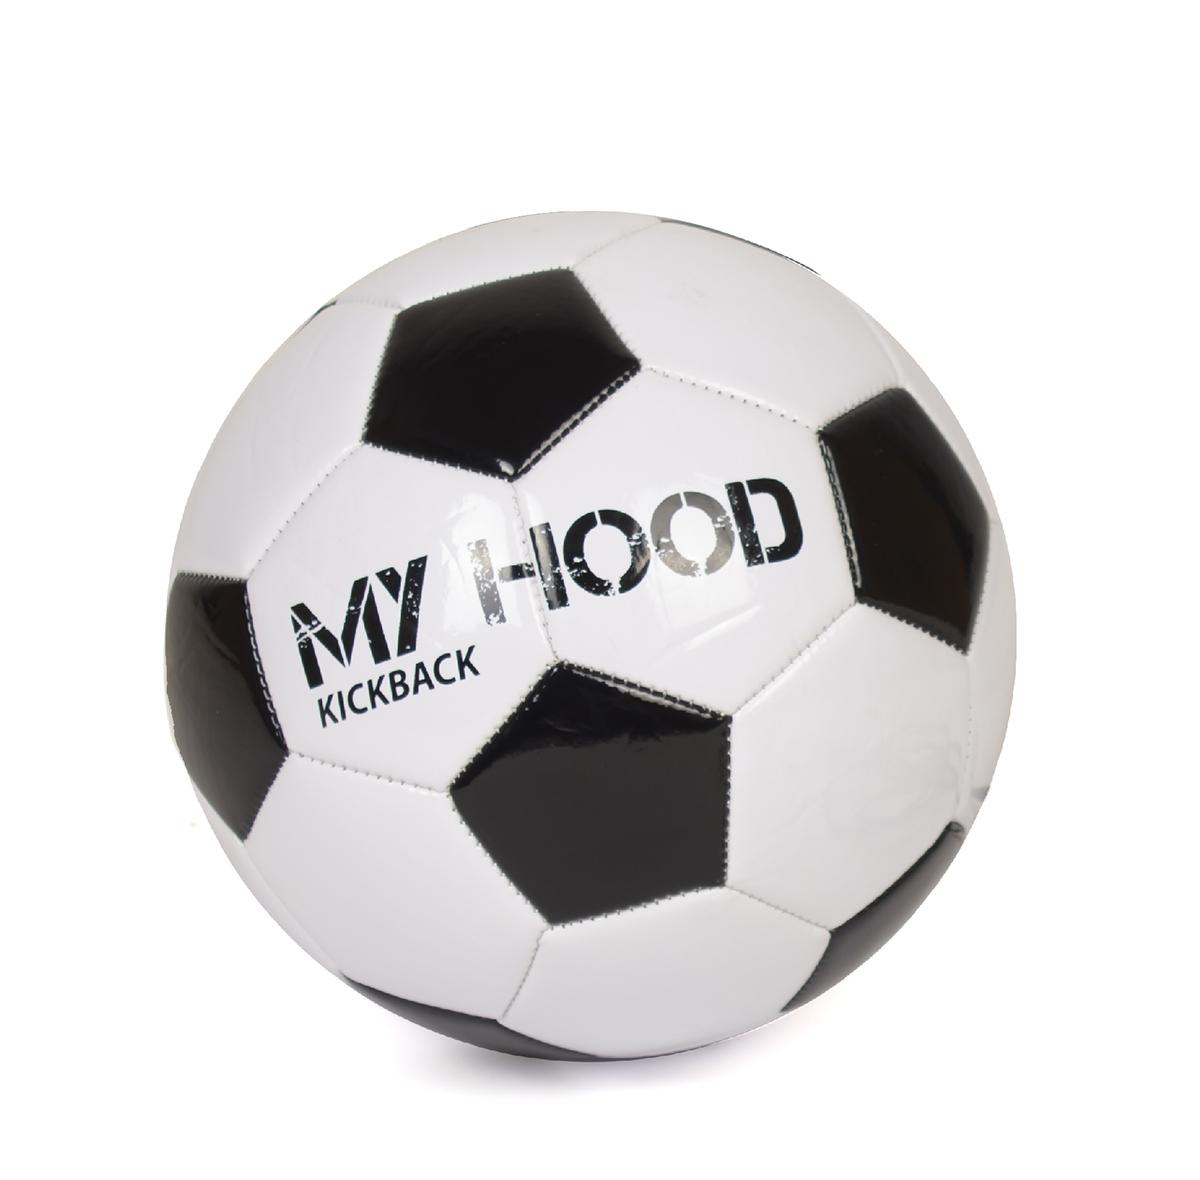 My Hood - Football Size 5 (302056)